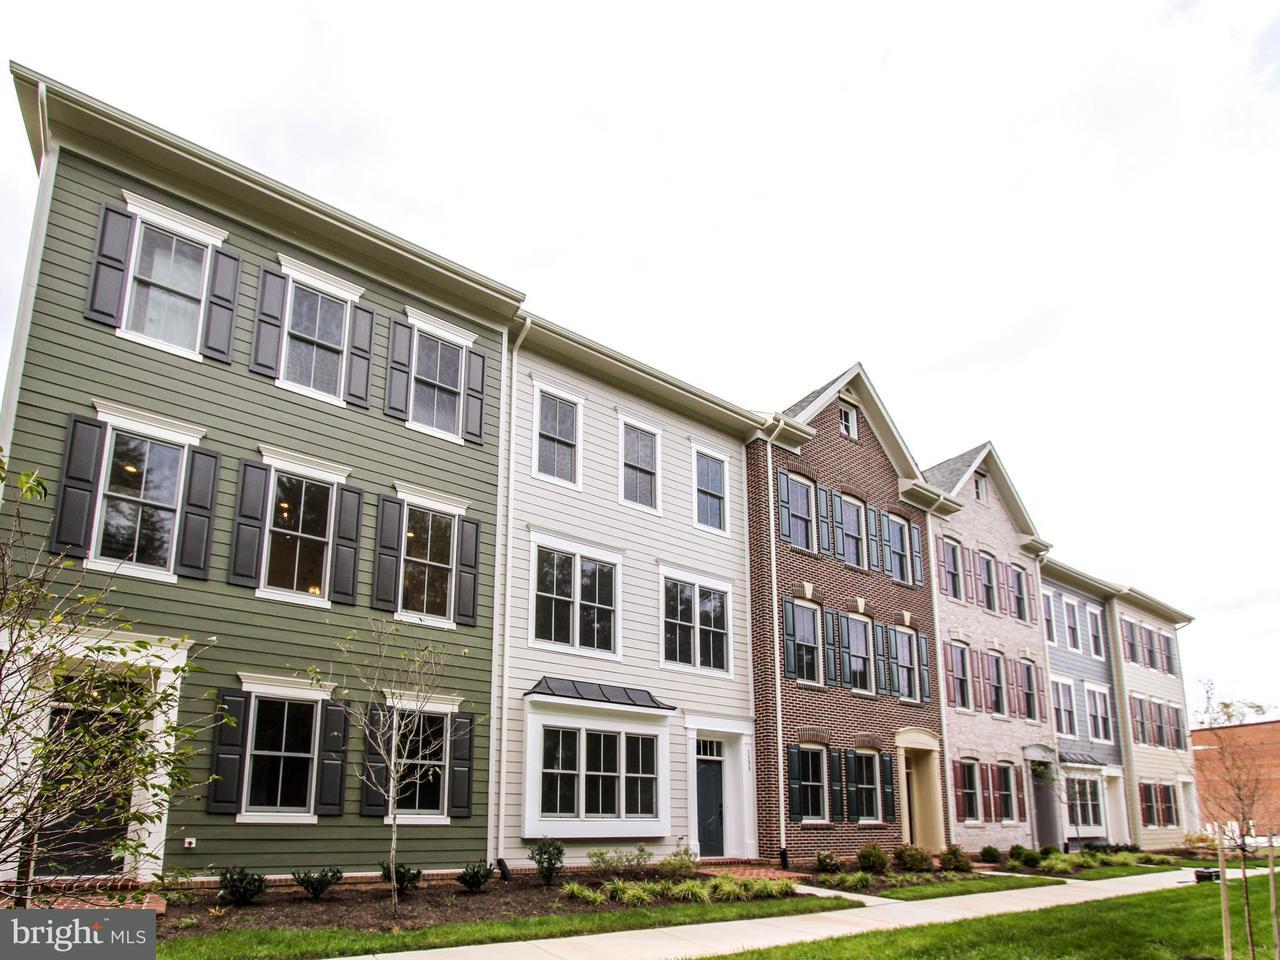 Single Family for Sale at 1355 Powhatan St #9 Alexandria, Virginia 22314 United States